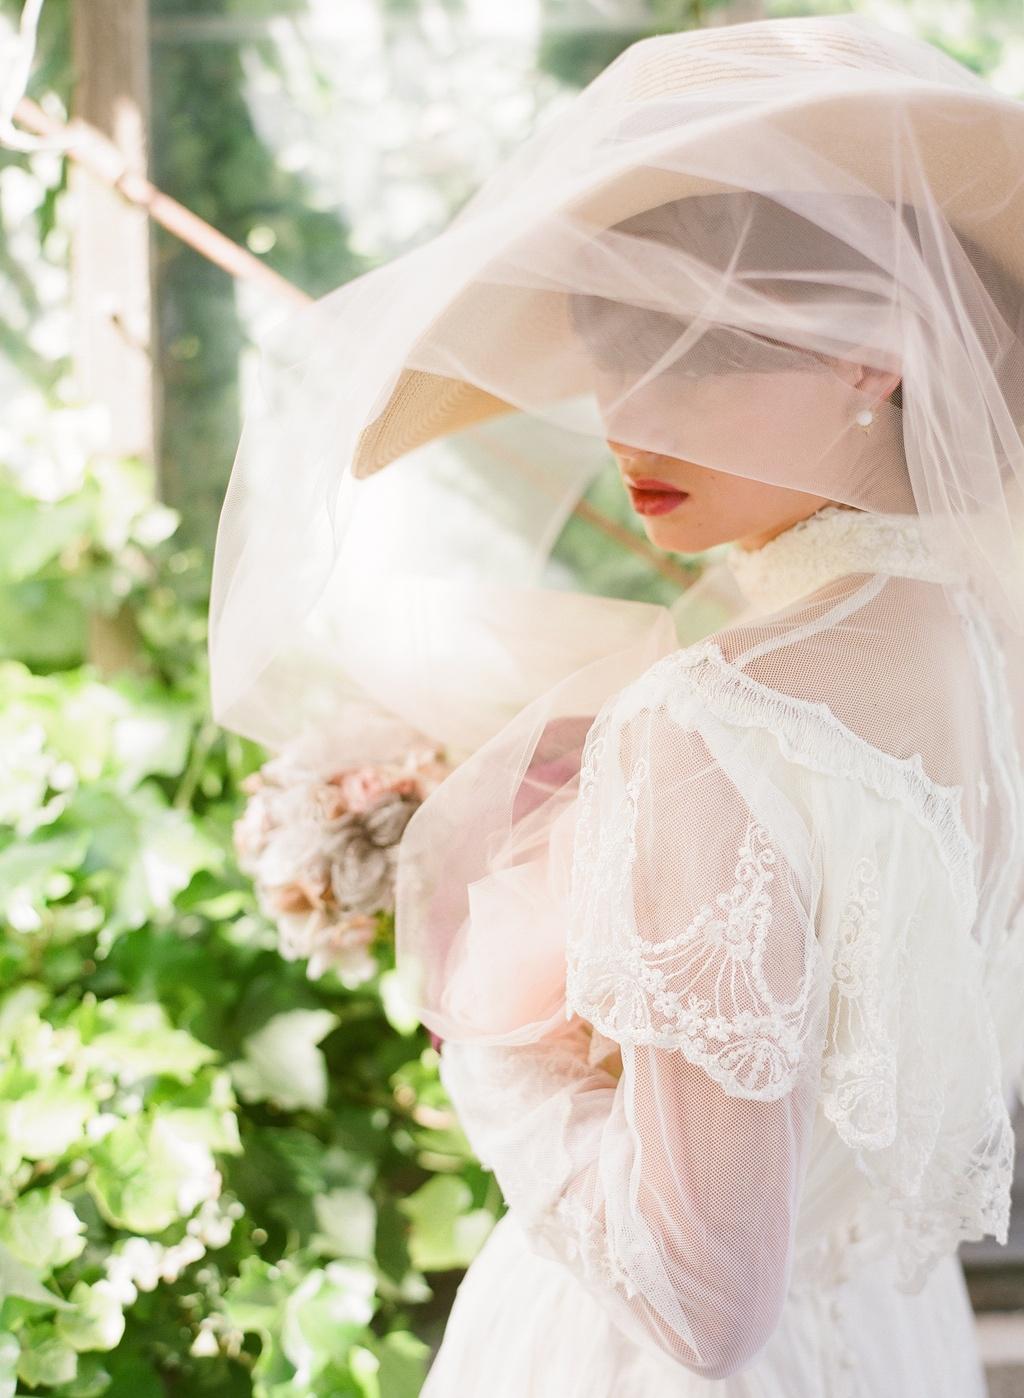 Styled-wedding-beaux-arts-tea-time-monique-lhuillier-santa-barbara-chic-bride-hat-35.full